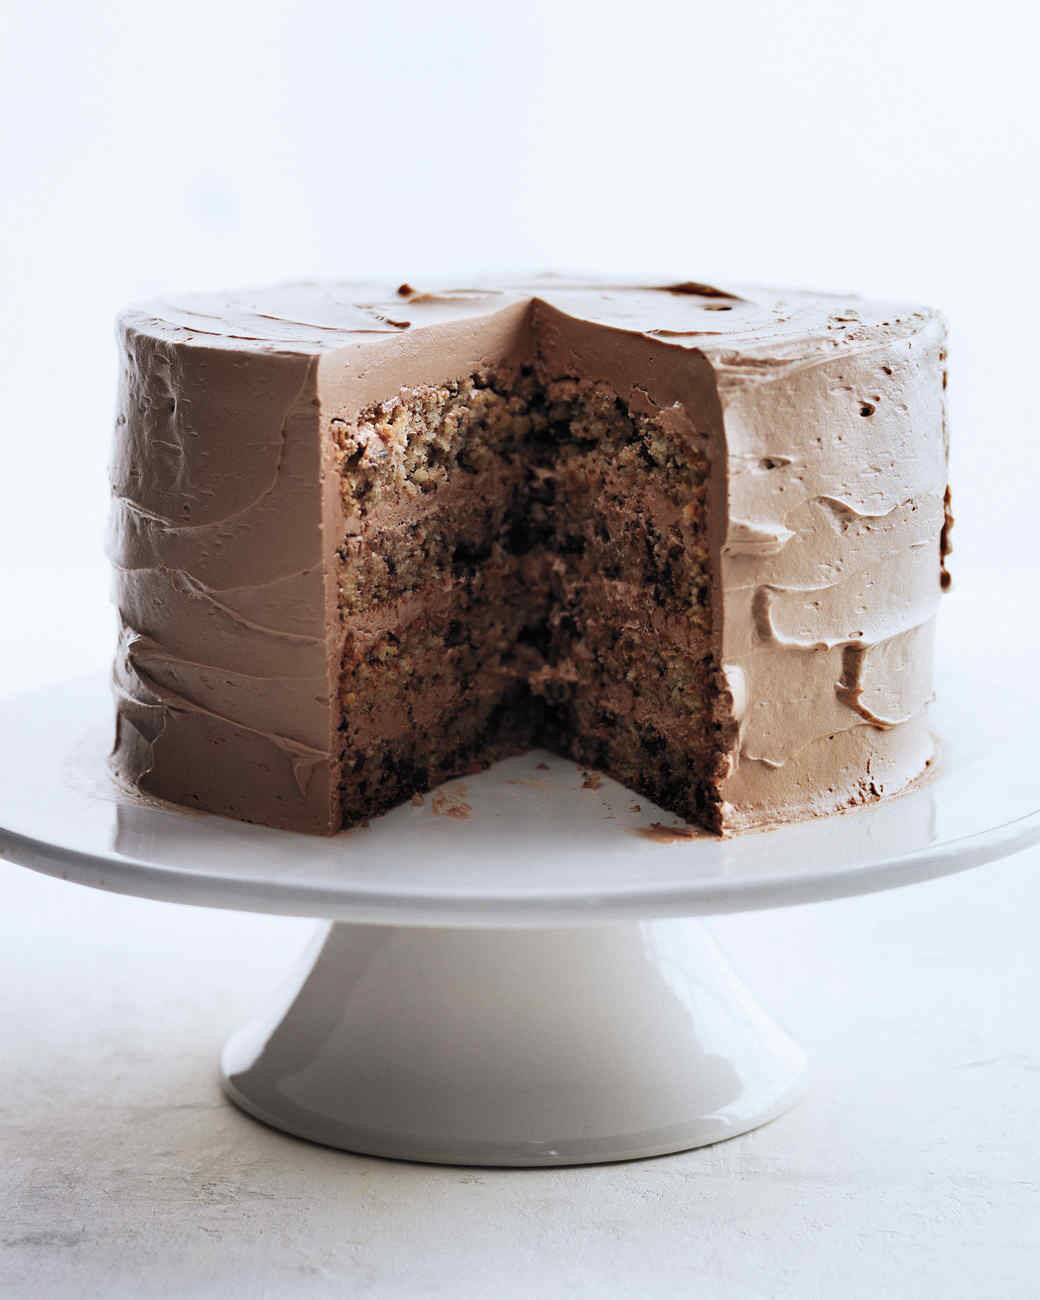 Chocolate Layer Cake Recipe  Chocolate Flecked Layer Cake with Milk Chocolate Frosting